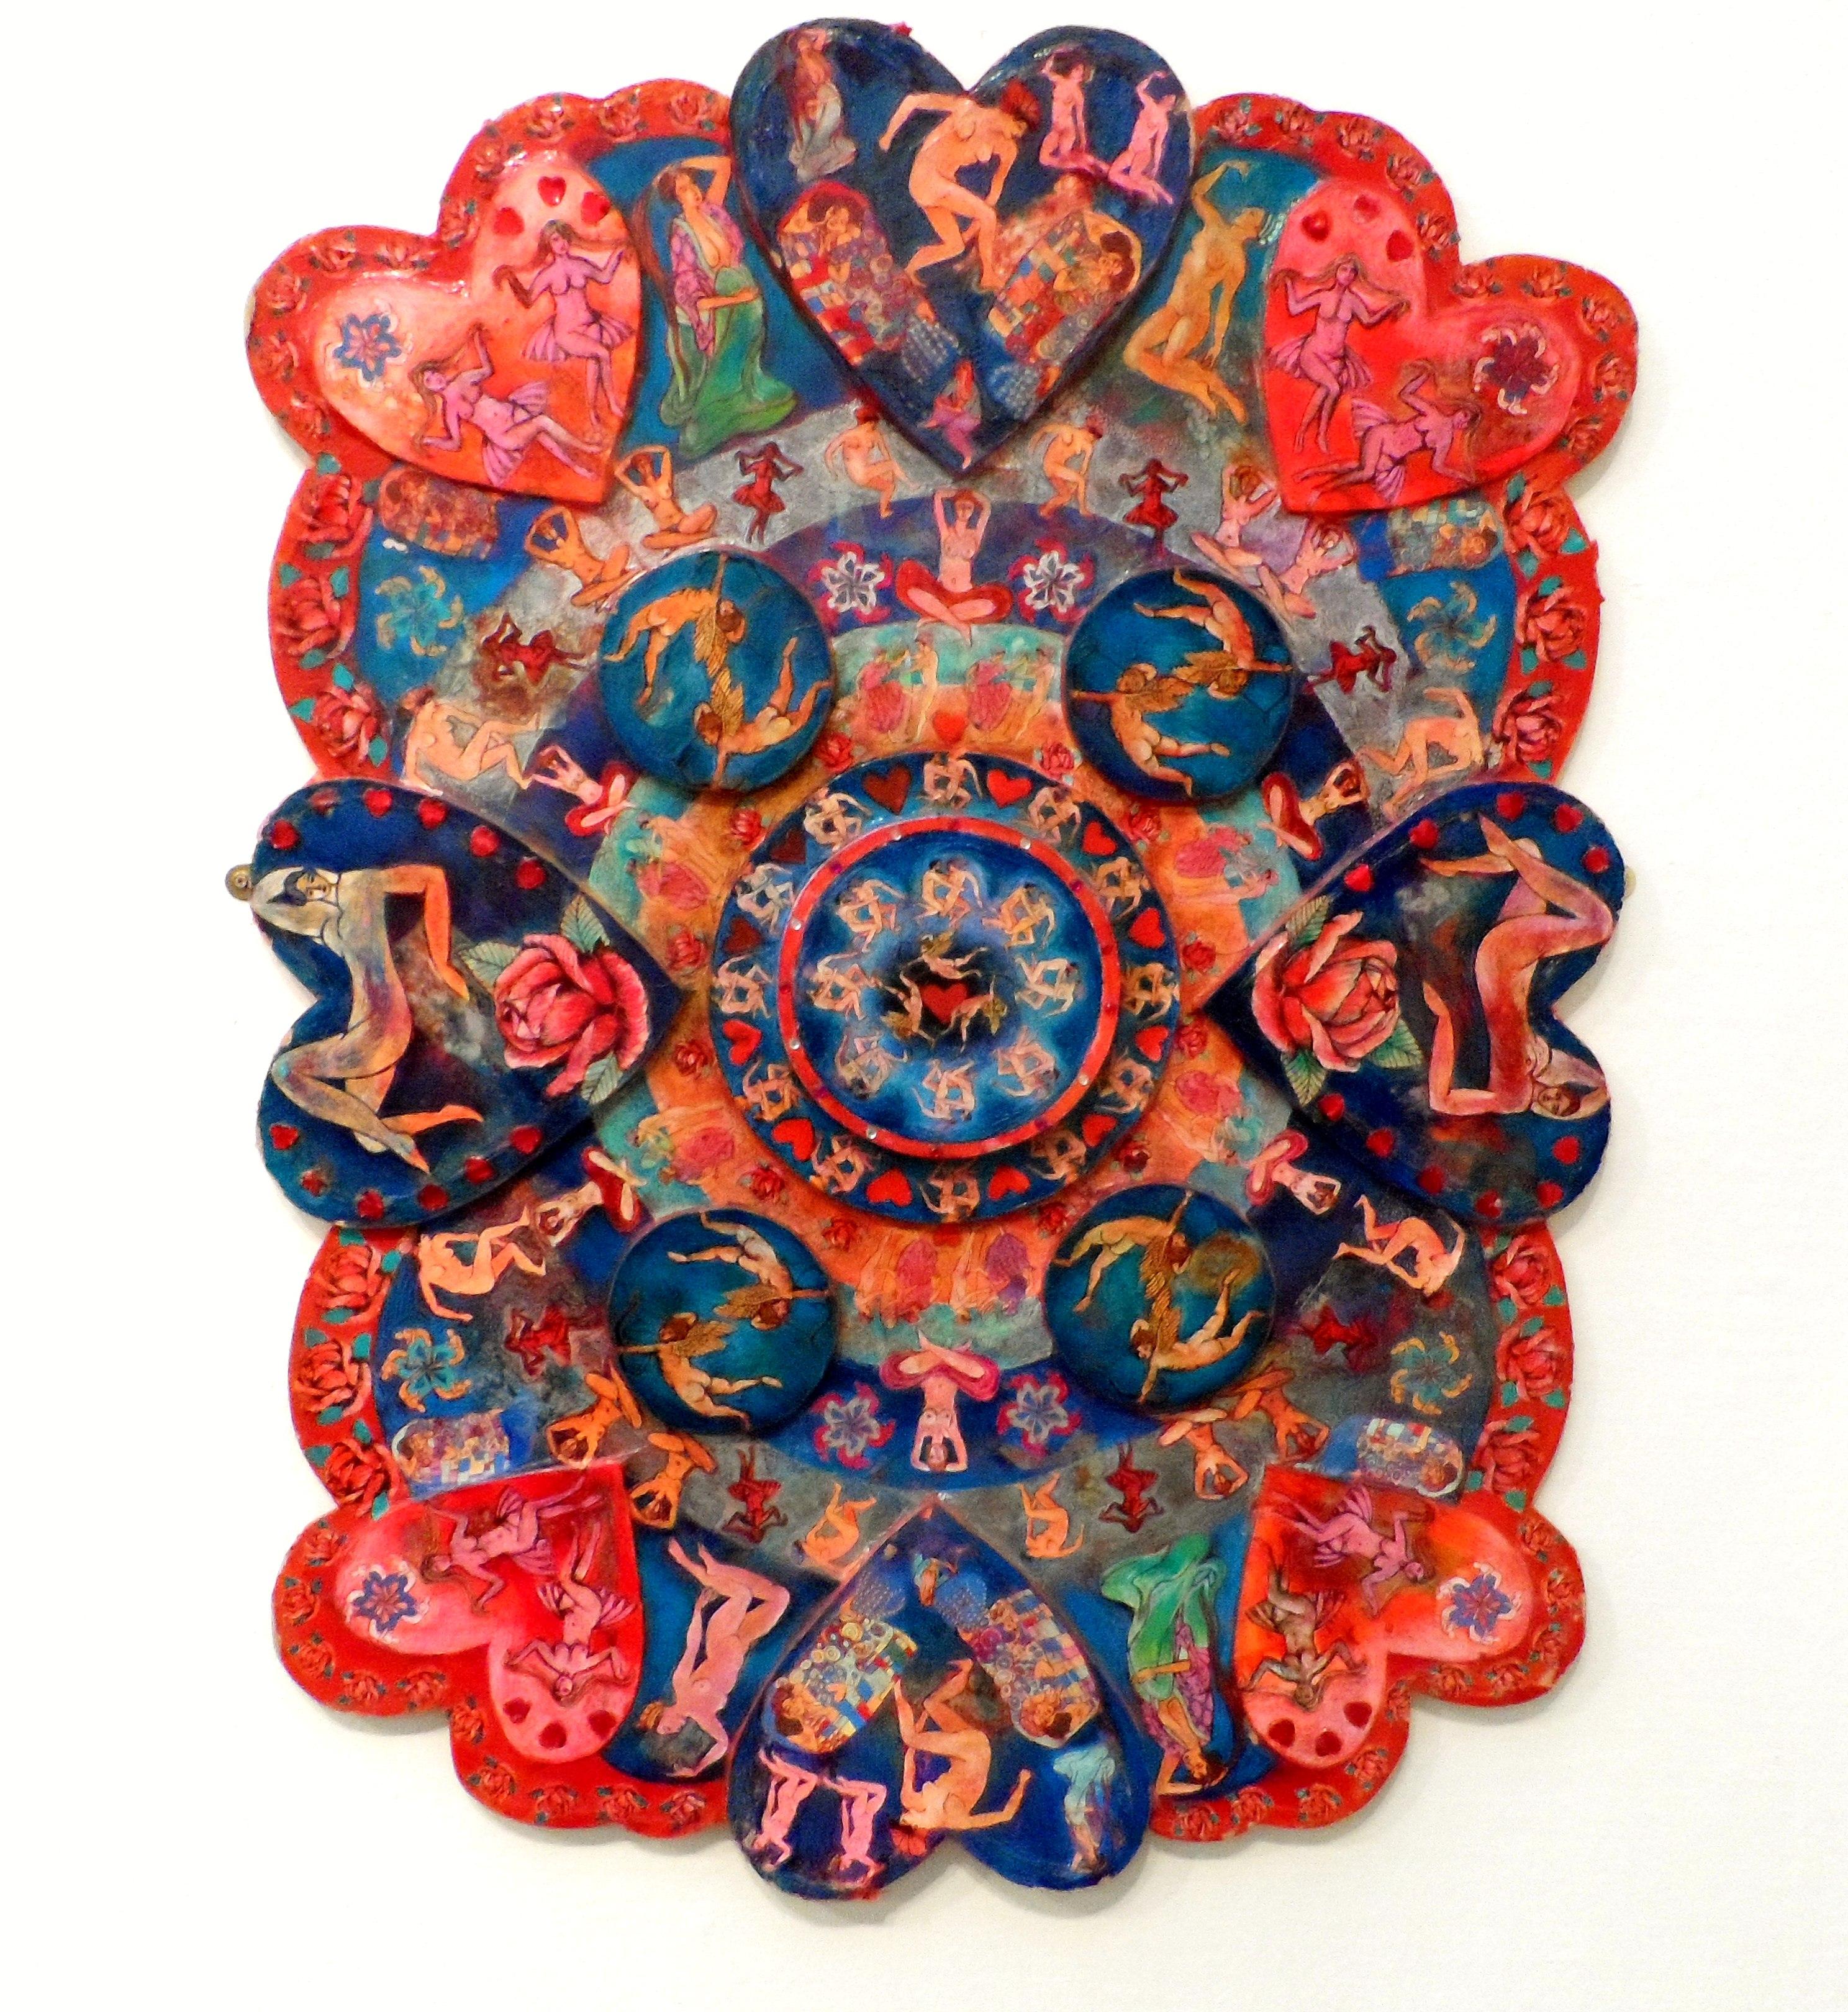 LOVE MANDALA by Nikki Parmenter, Williamson Gallery, 2019